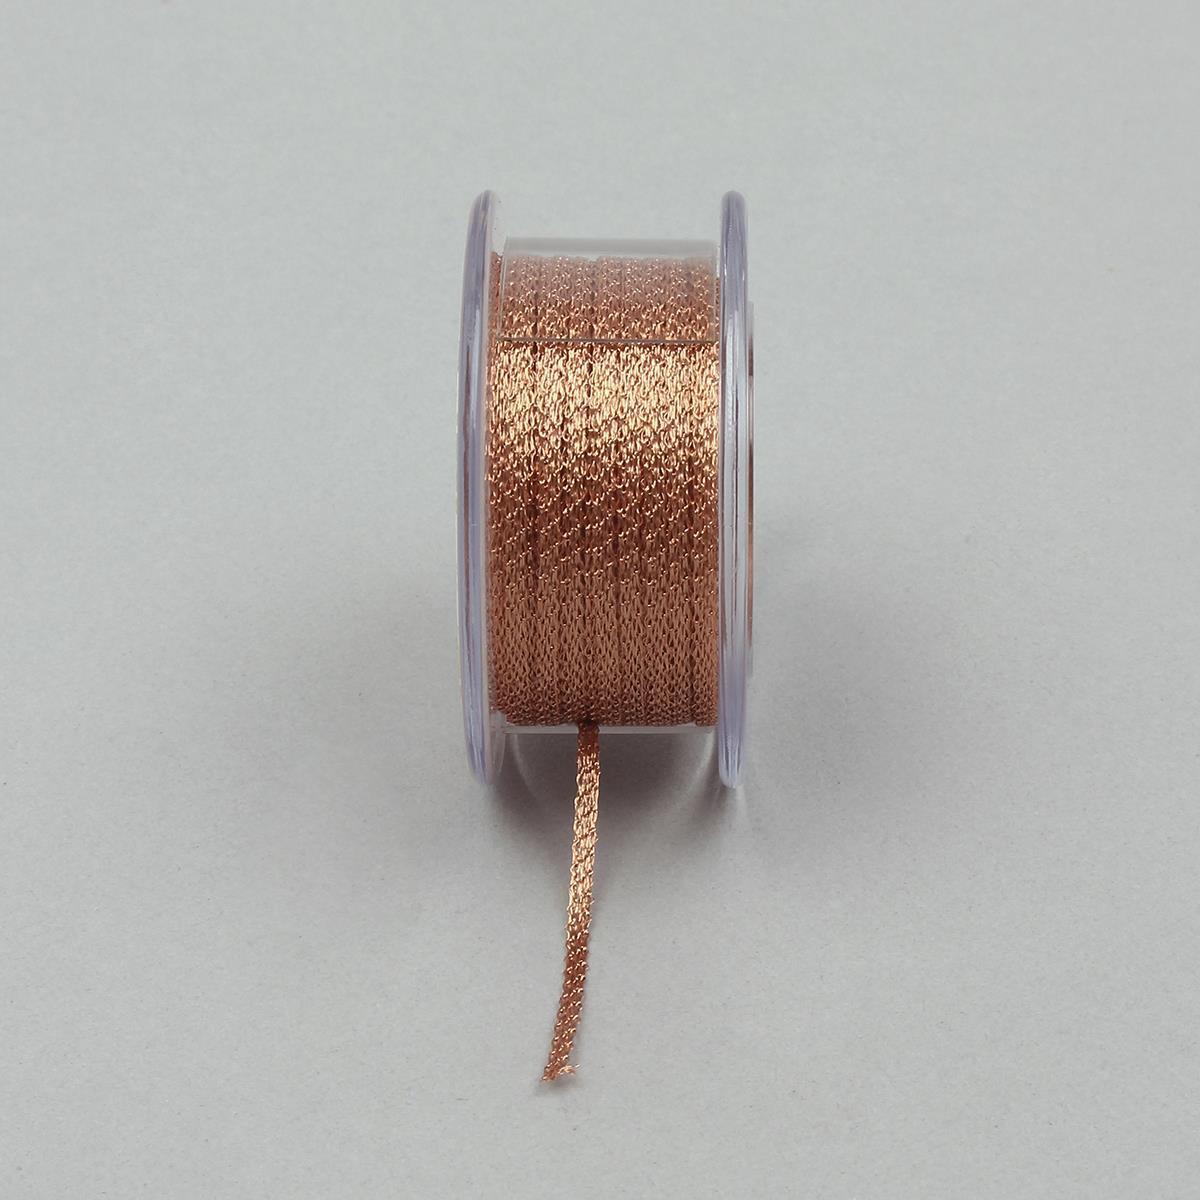 10 Yards Copper Wire Mesh 1mm | JewelleryMaker.com